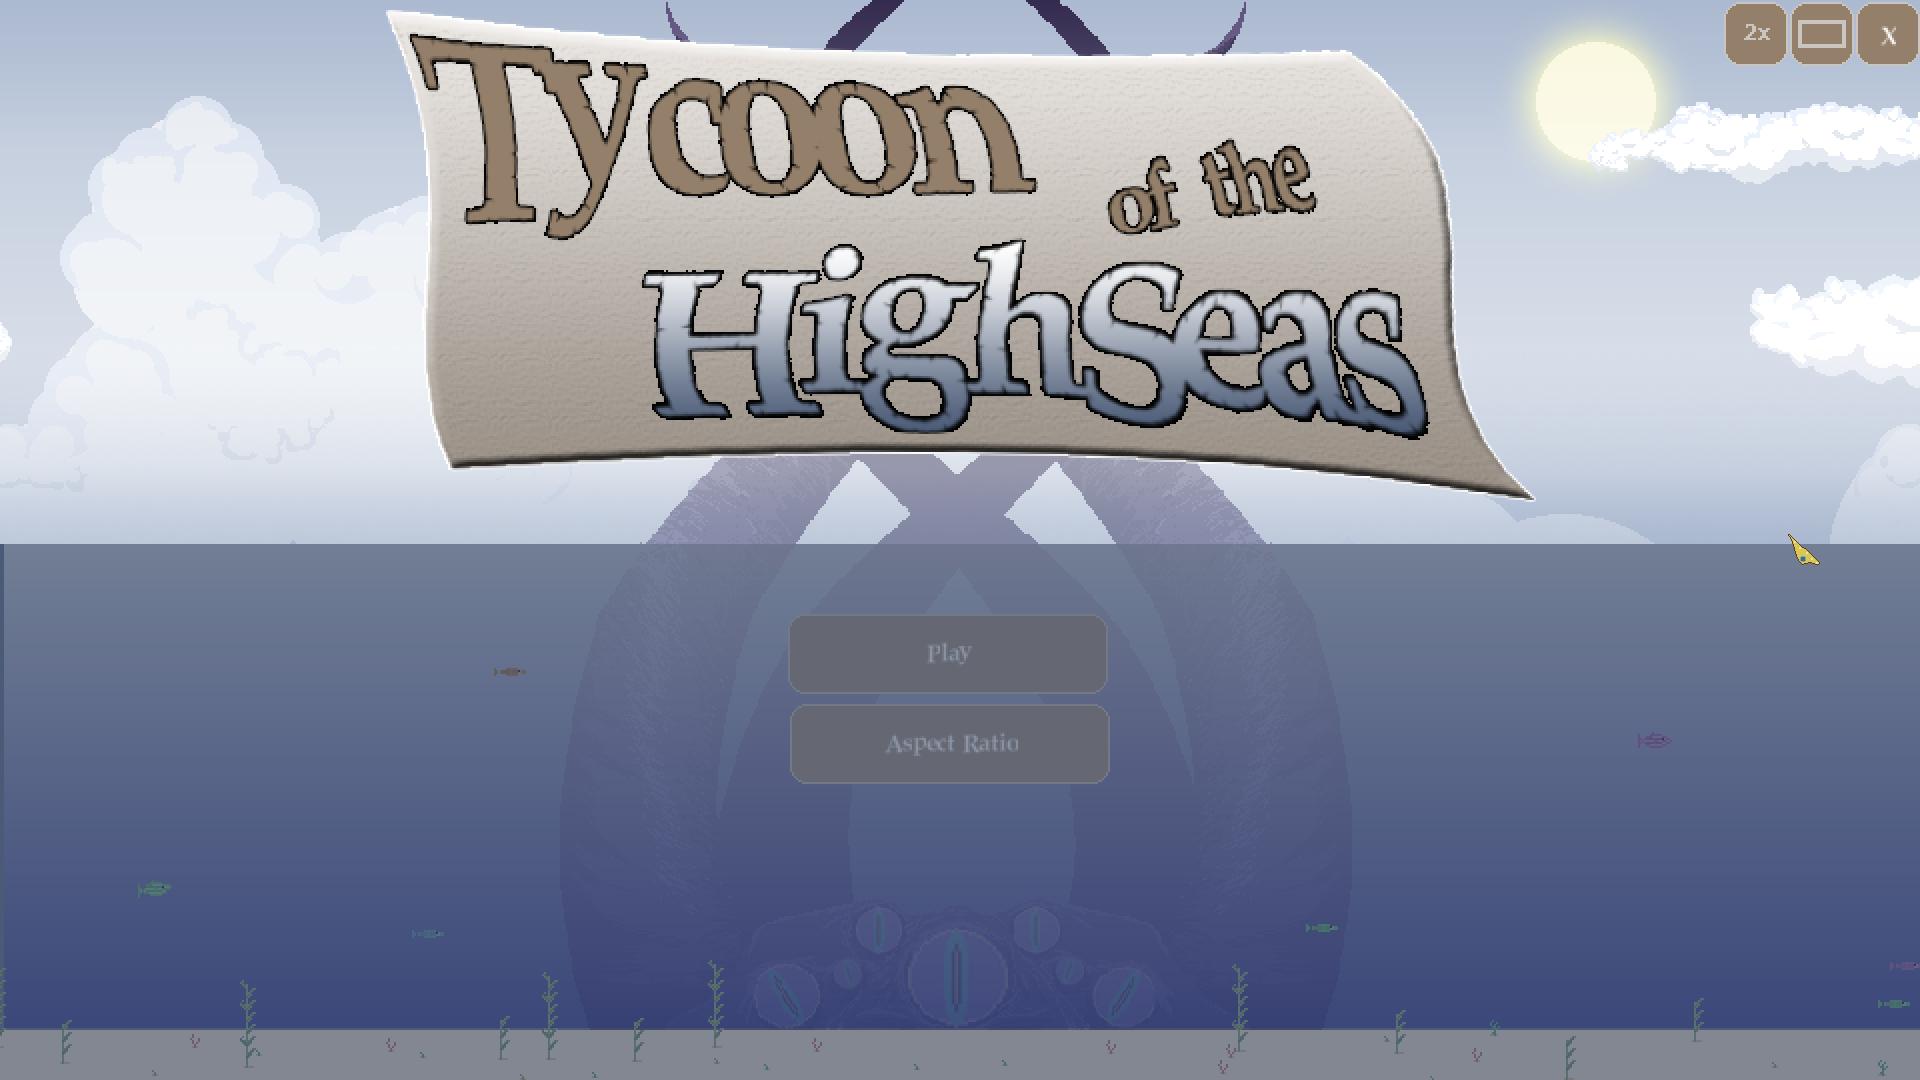 Tycoon of the HighSeas